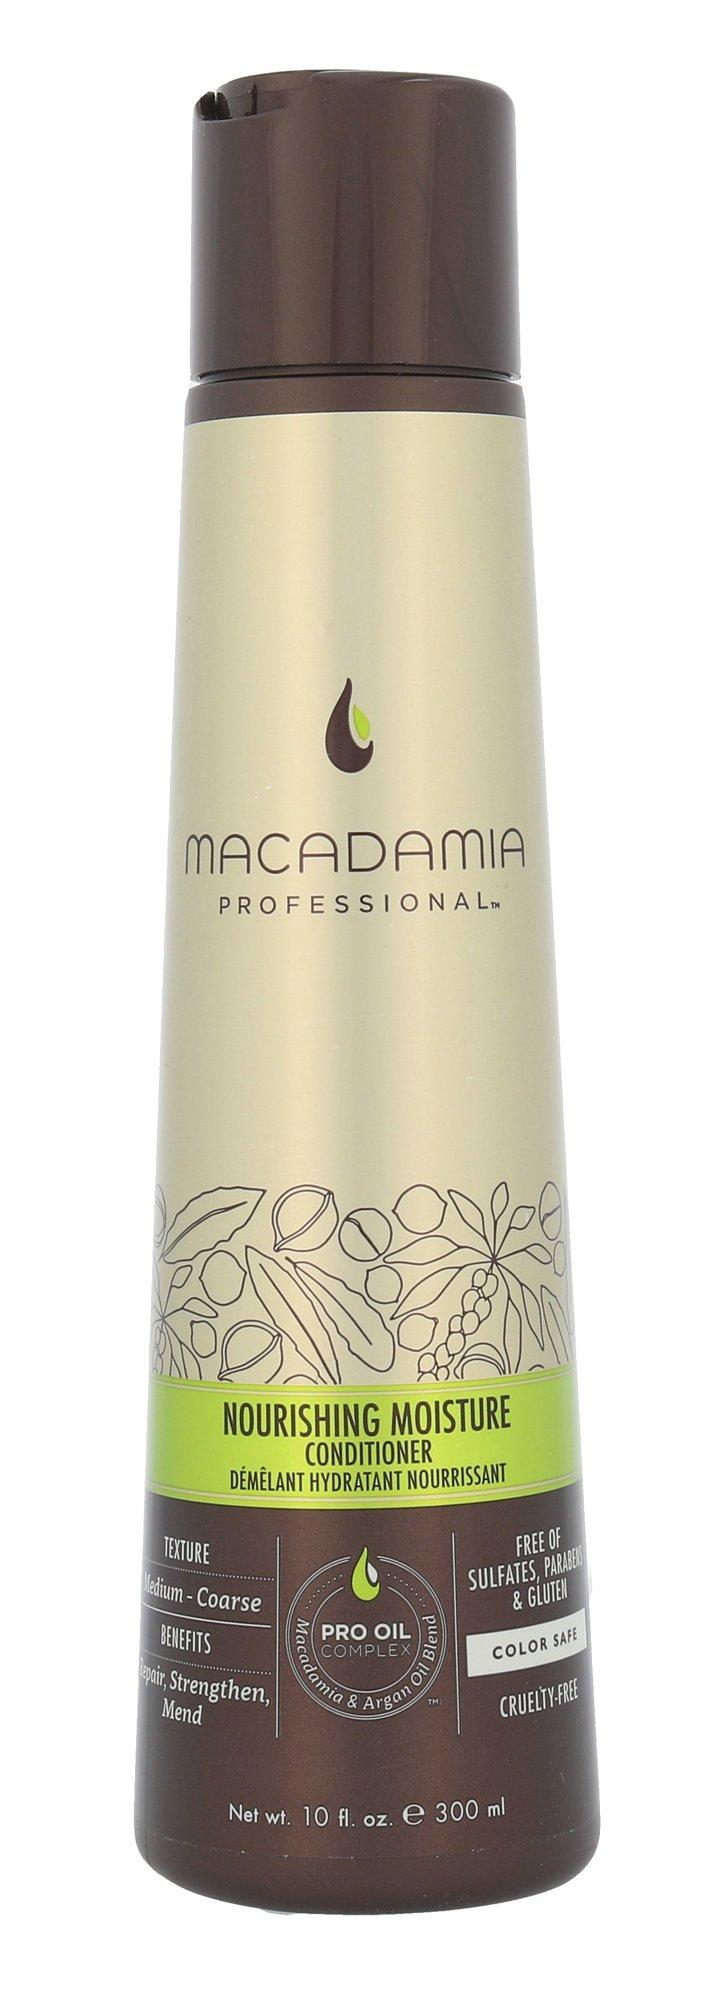 Macadamia Professional Nourishing Moisture Cosmetic 300ml